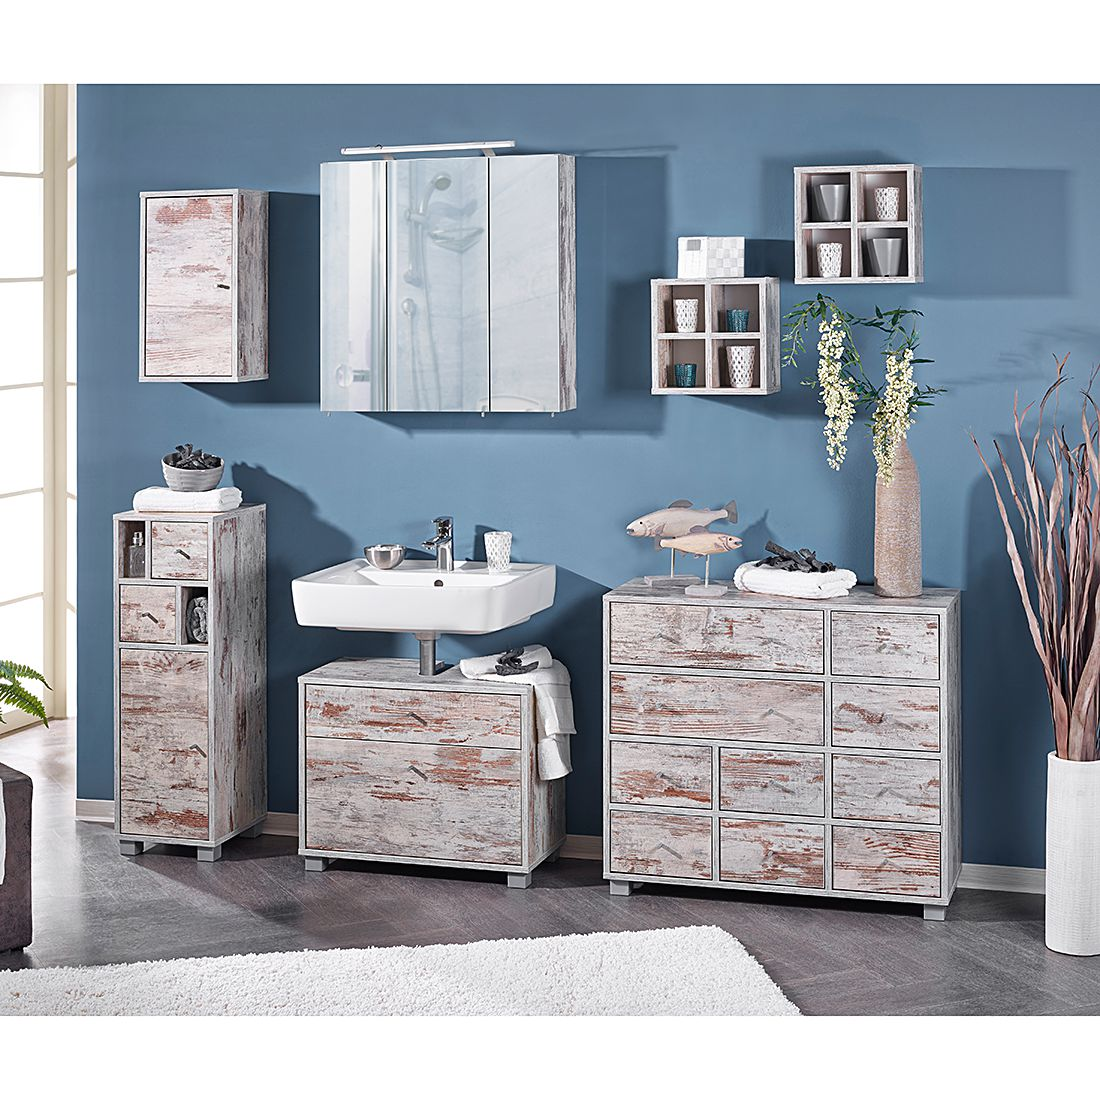 schildmeyer kommode verna iii sideboard badschrank highboard badezimmer ebay. Black Bedroom Furniture Sets. Home Design Ideas